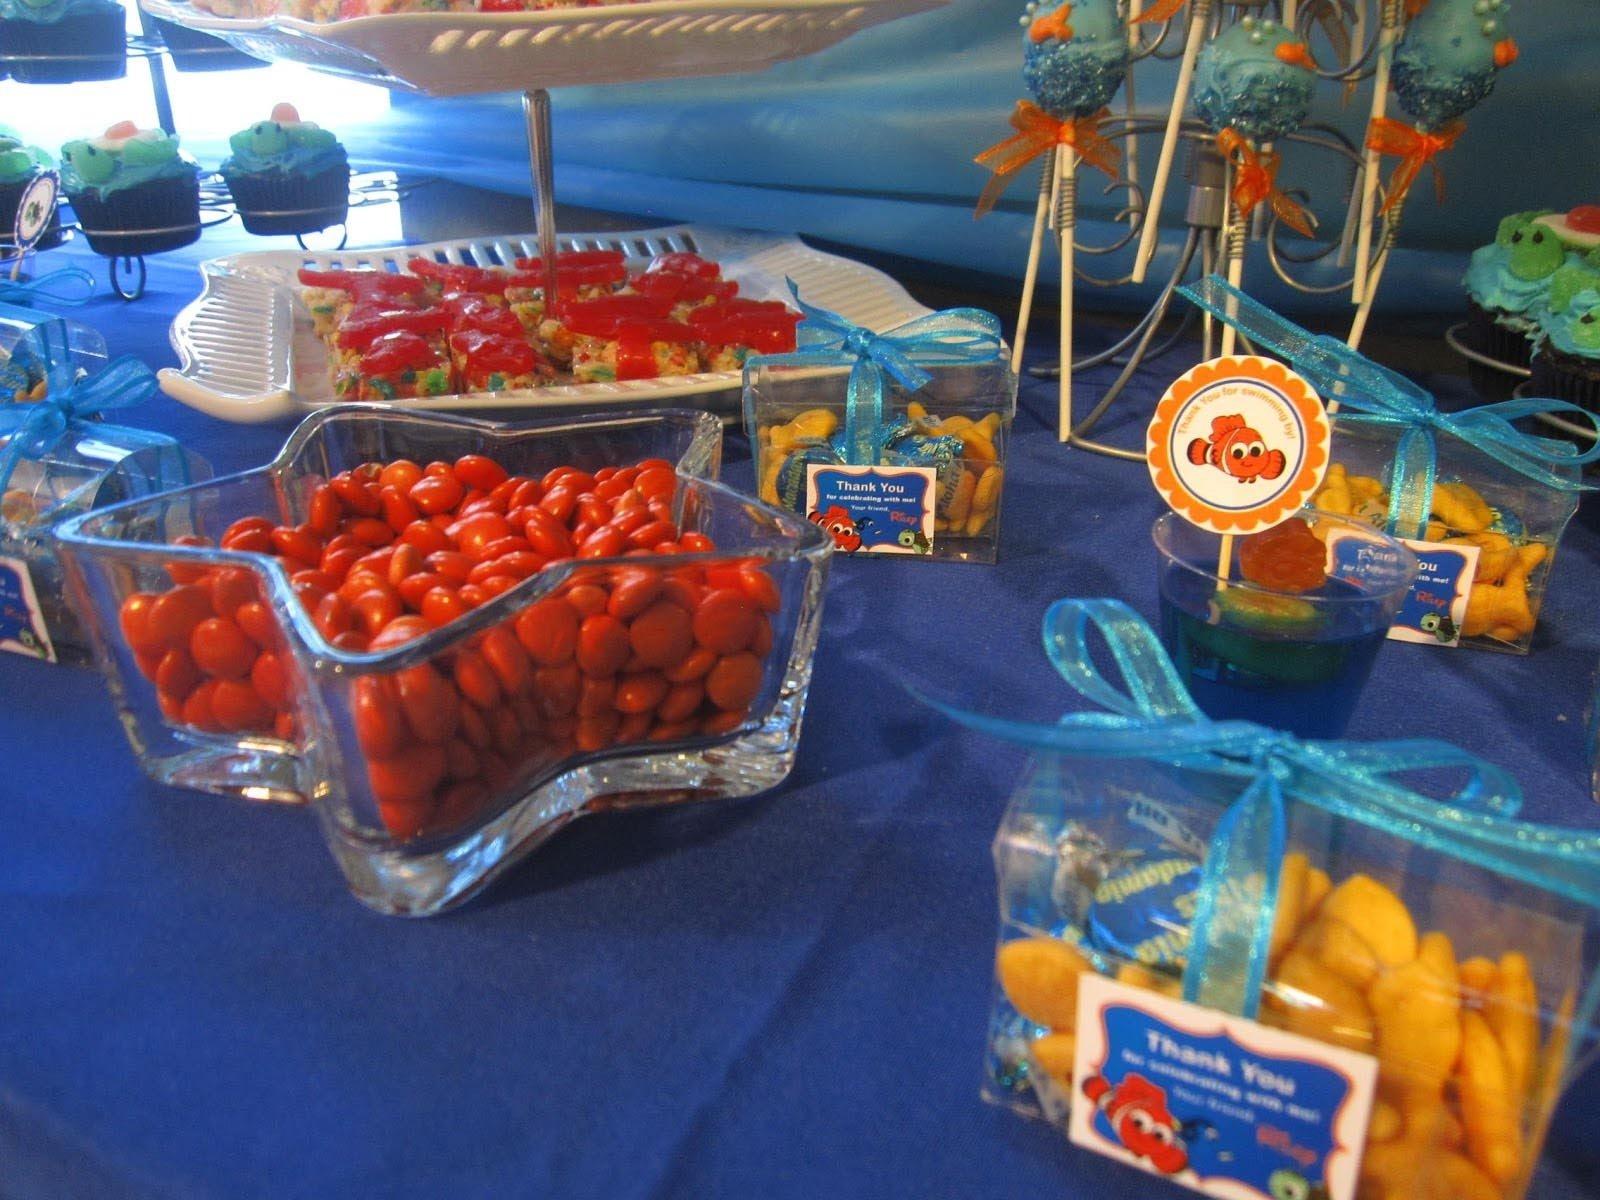 10 Stylish Finding Nemo Birthday Party Ideas finding nemo birthday party decorations home party ideas 2020